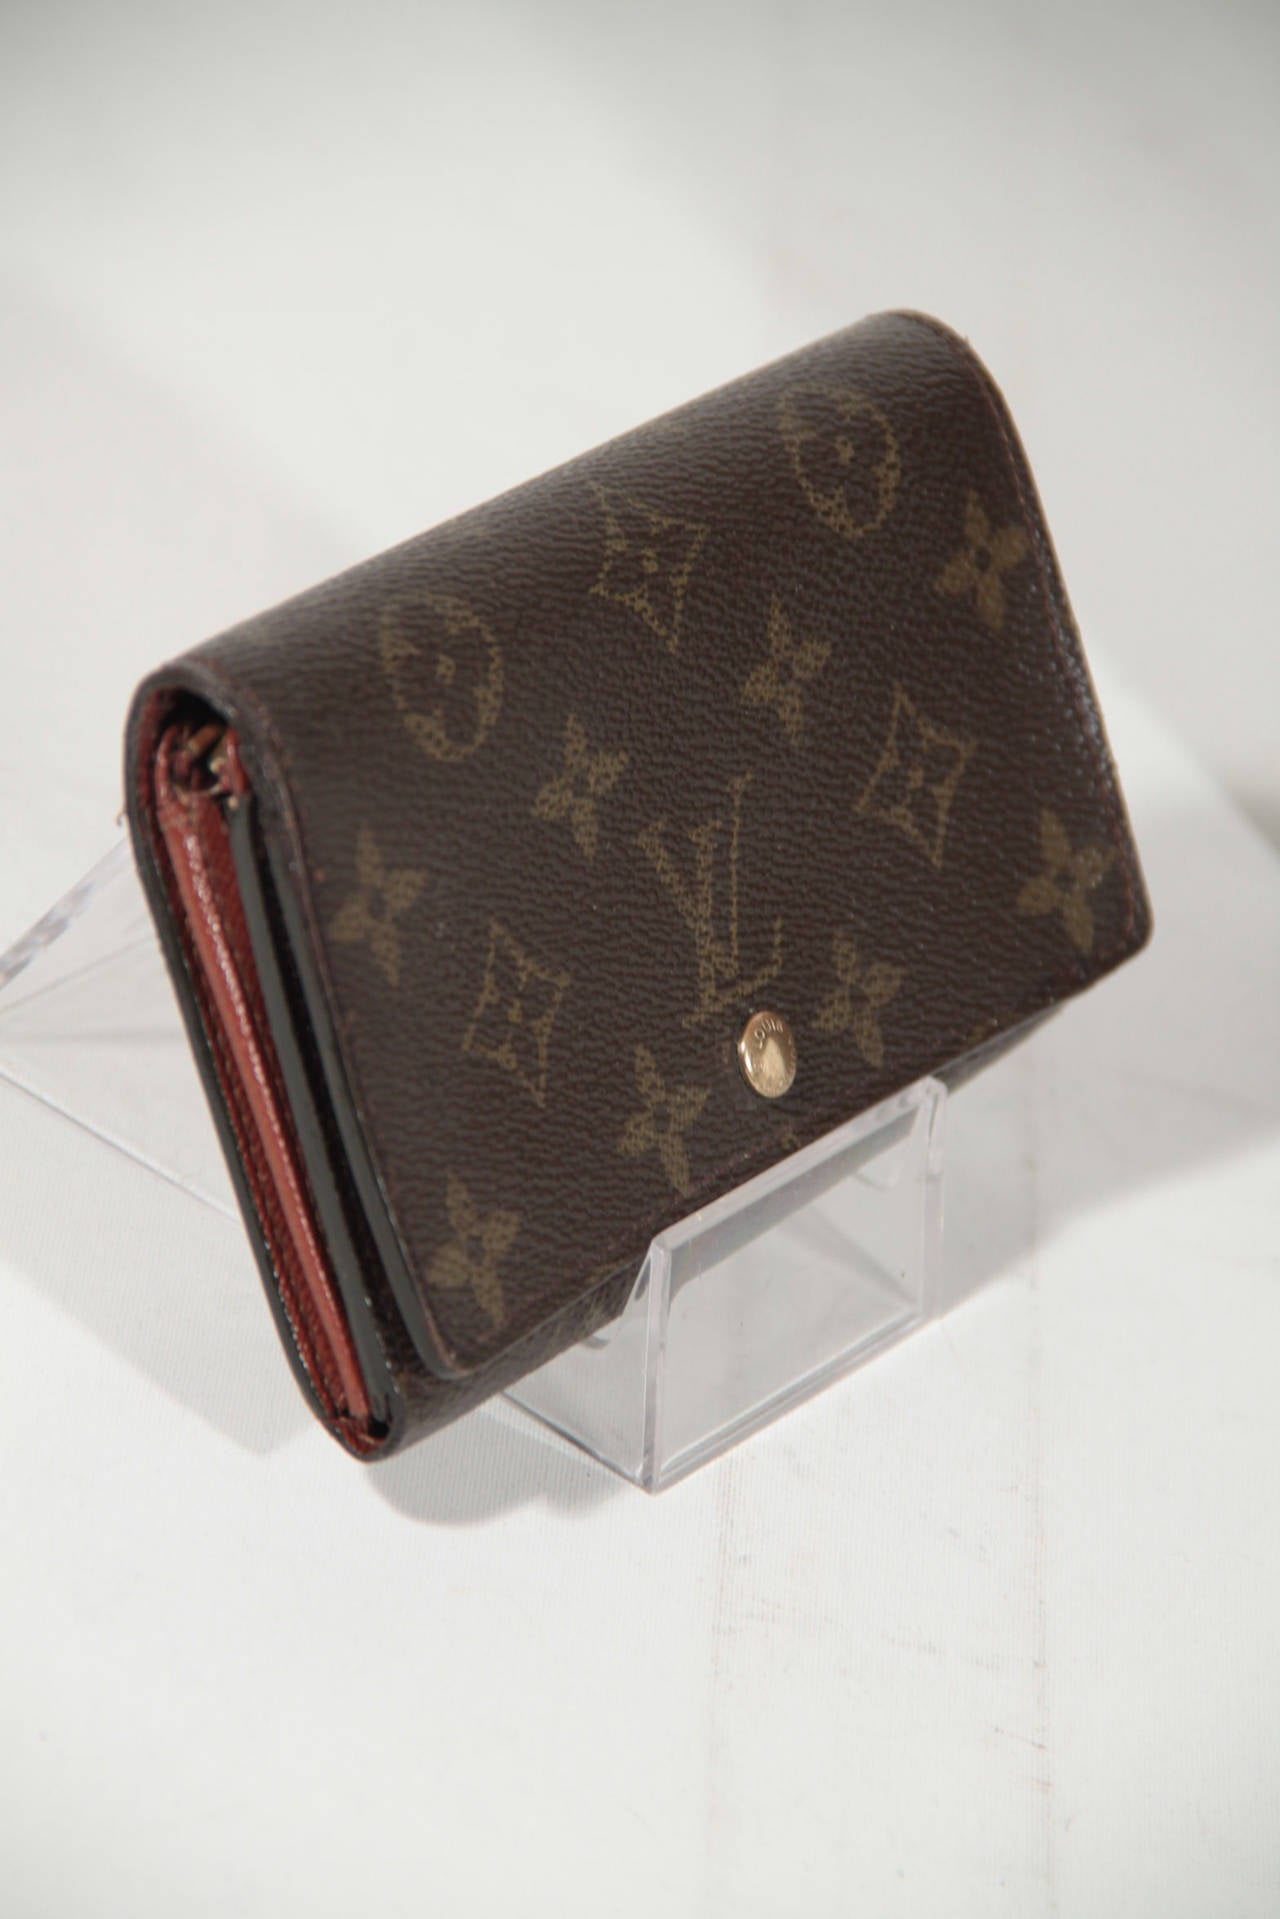 Gucci Belt Serial Number >> LOUIS VUITTON Monogram Canvas TRESOR WALLET Coin Purse w/ BOX at 1stdibs